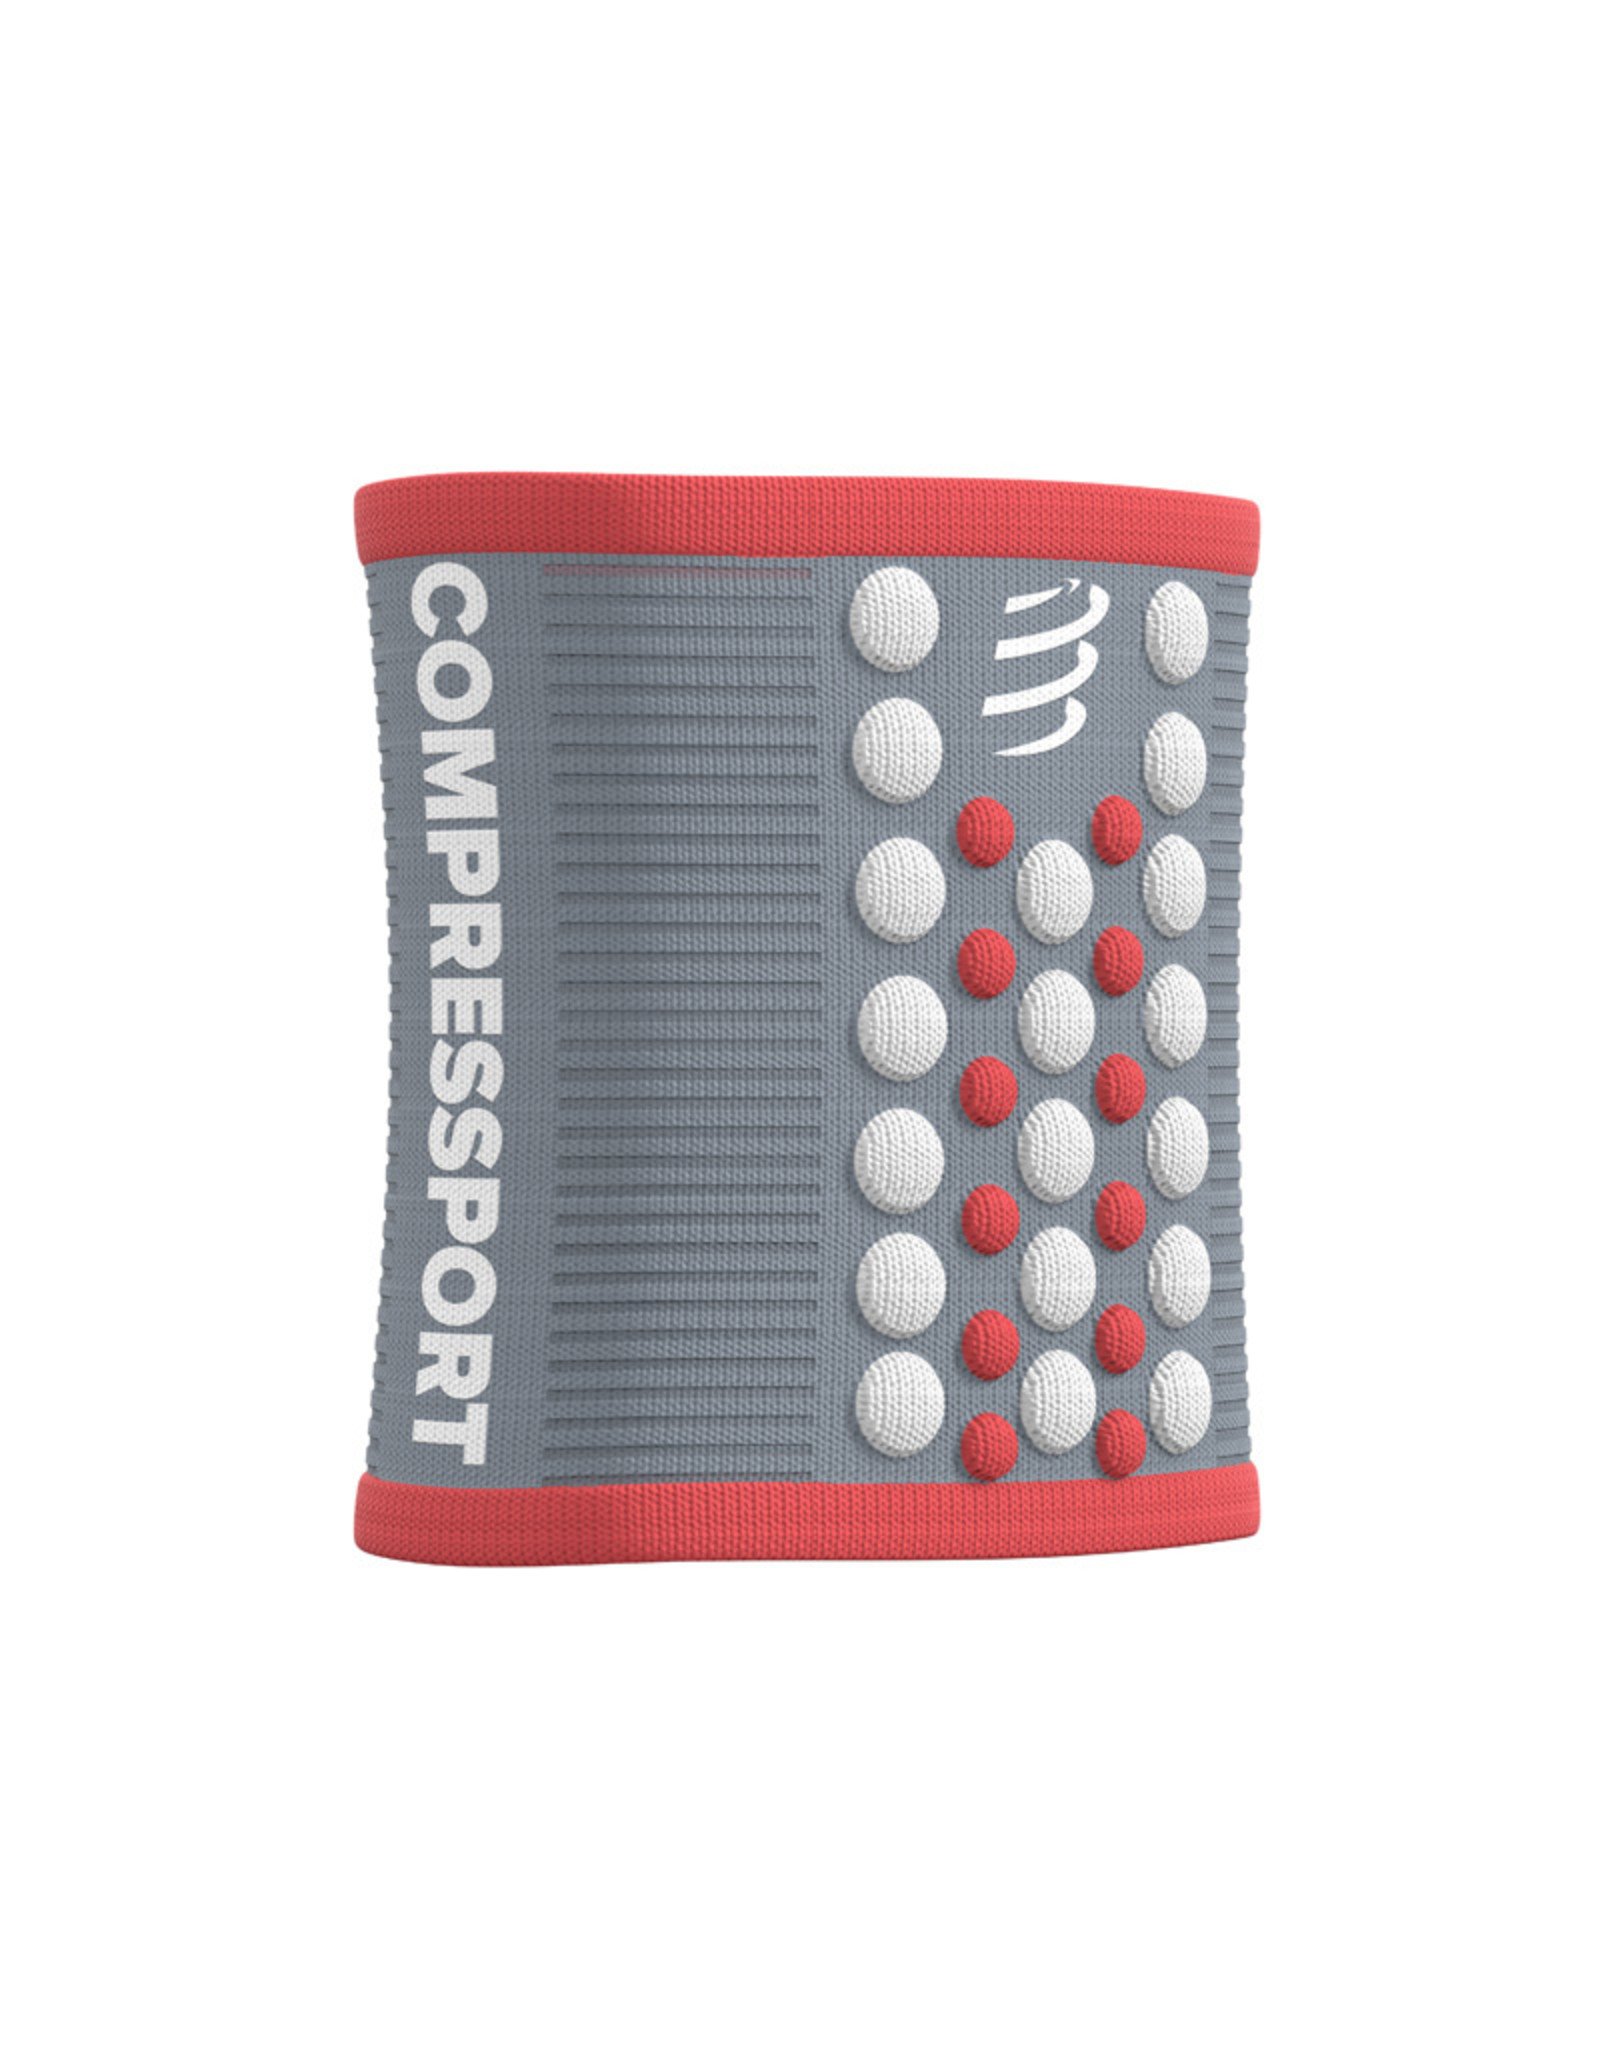 Compressport Sweatbands 3D.Dots - Gris/Rose